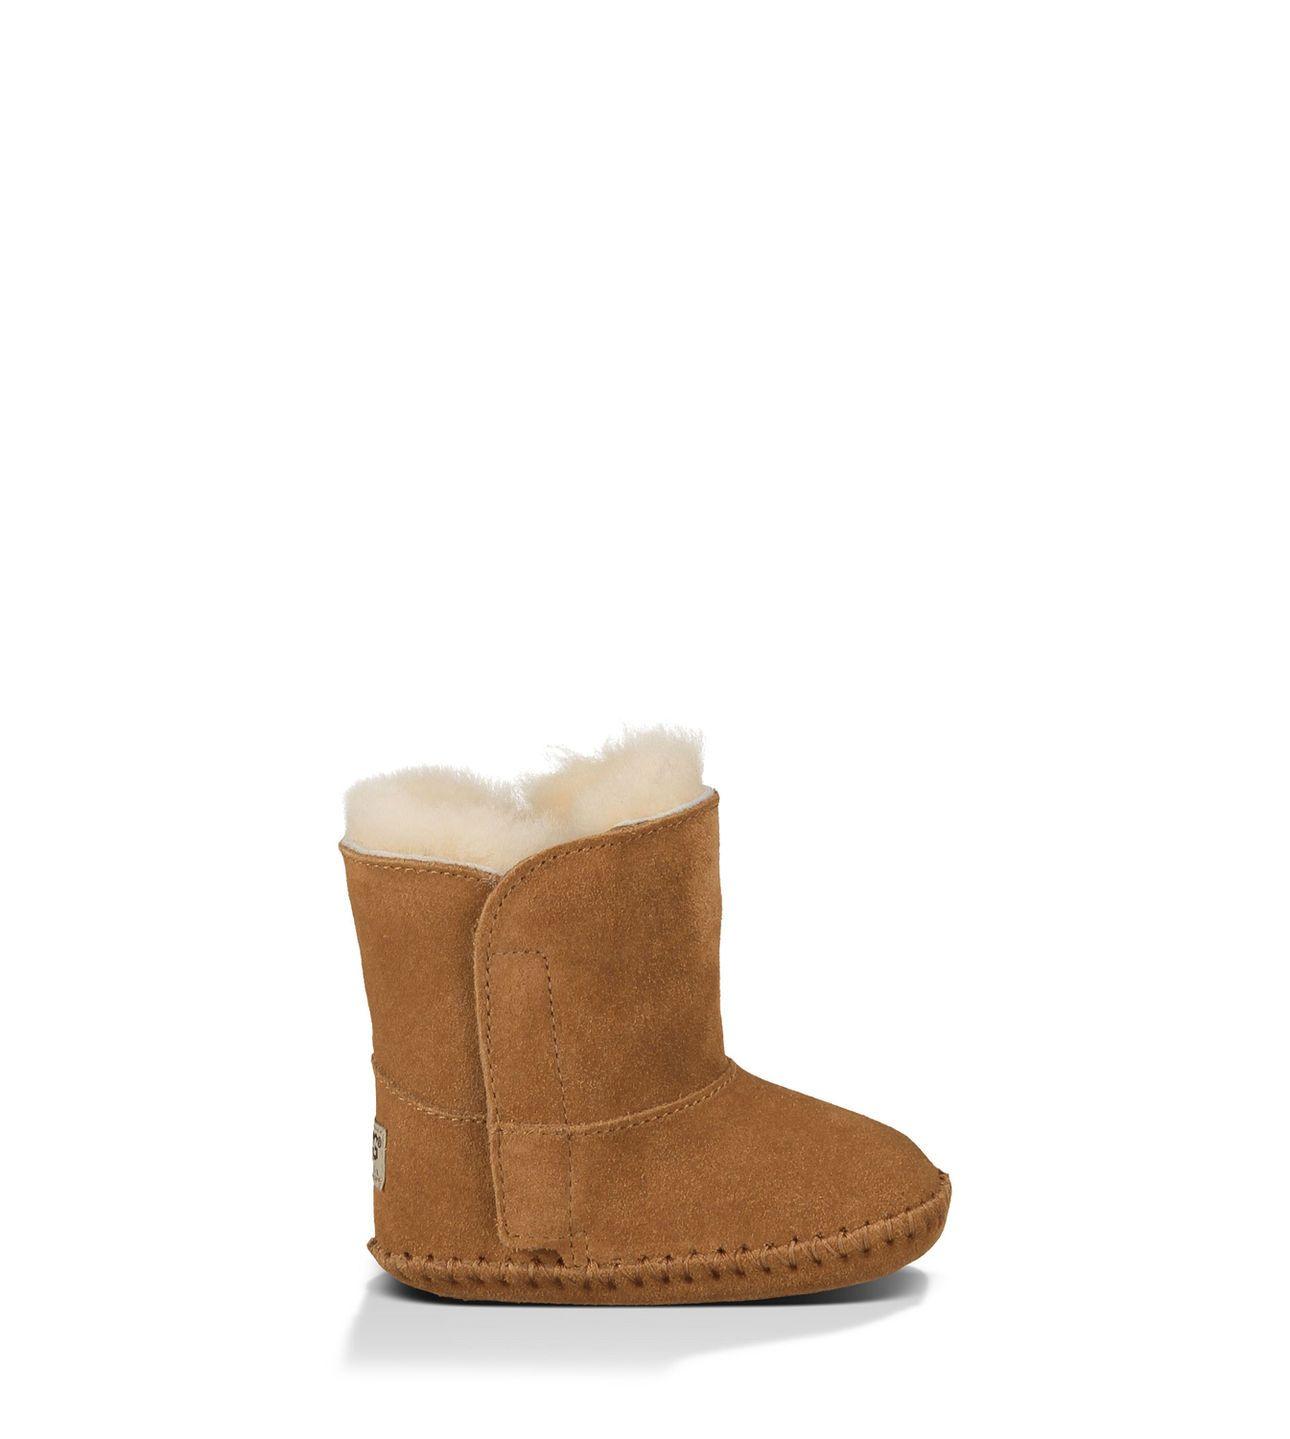 Winter booties for Baby J's tootsies!!